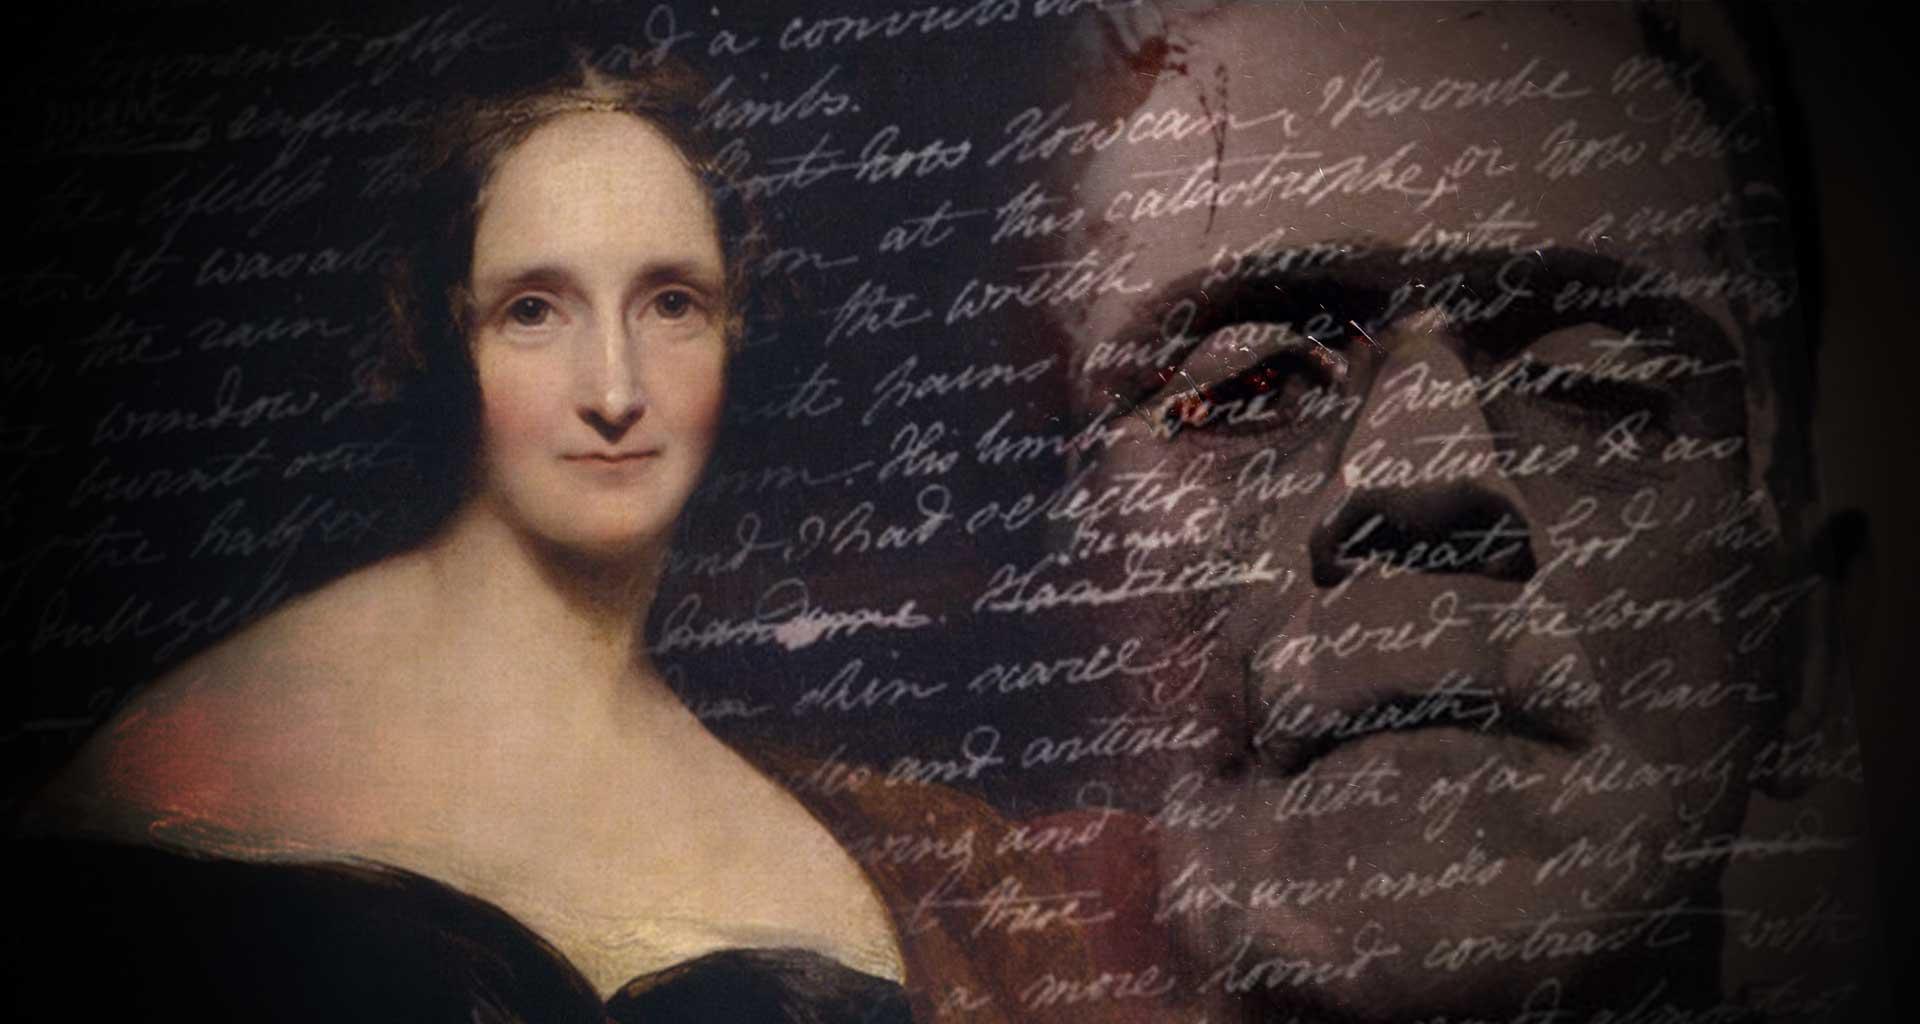 Shelley and Frankenstein